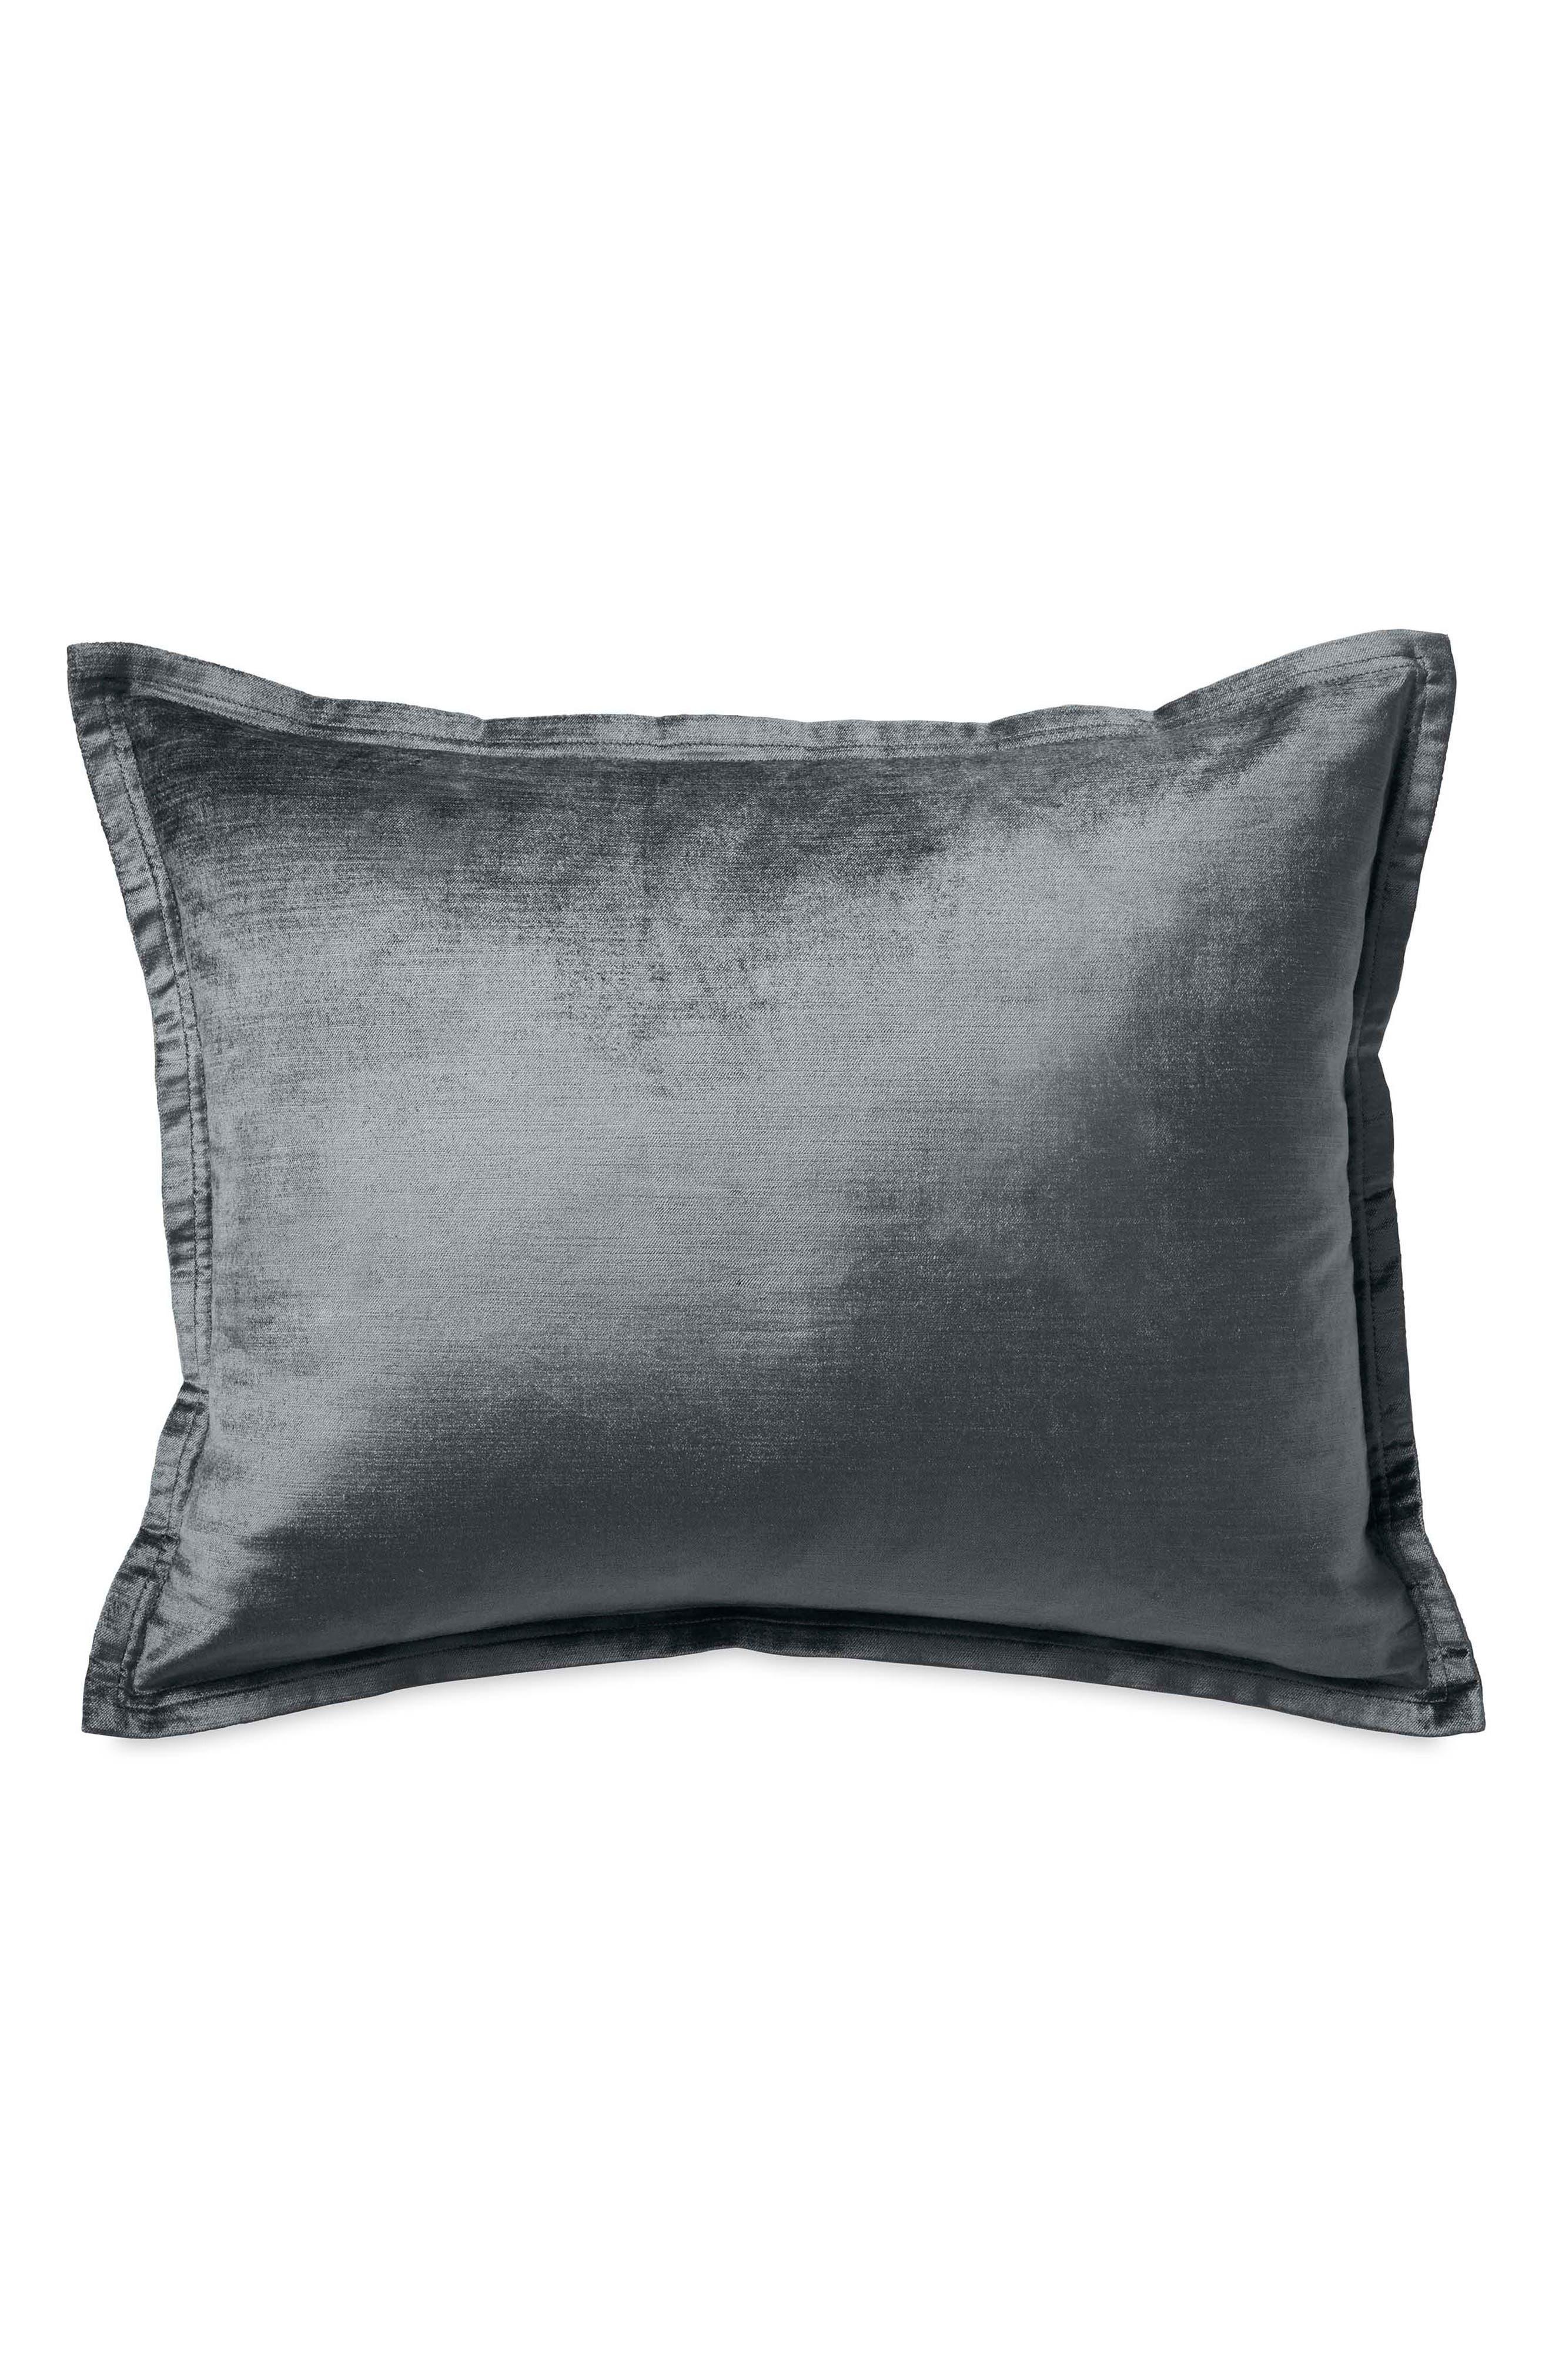 Donna Karan New York Exhale Pillow